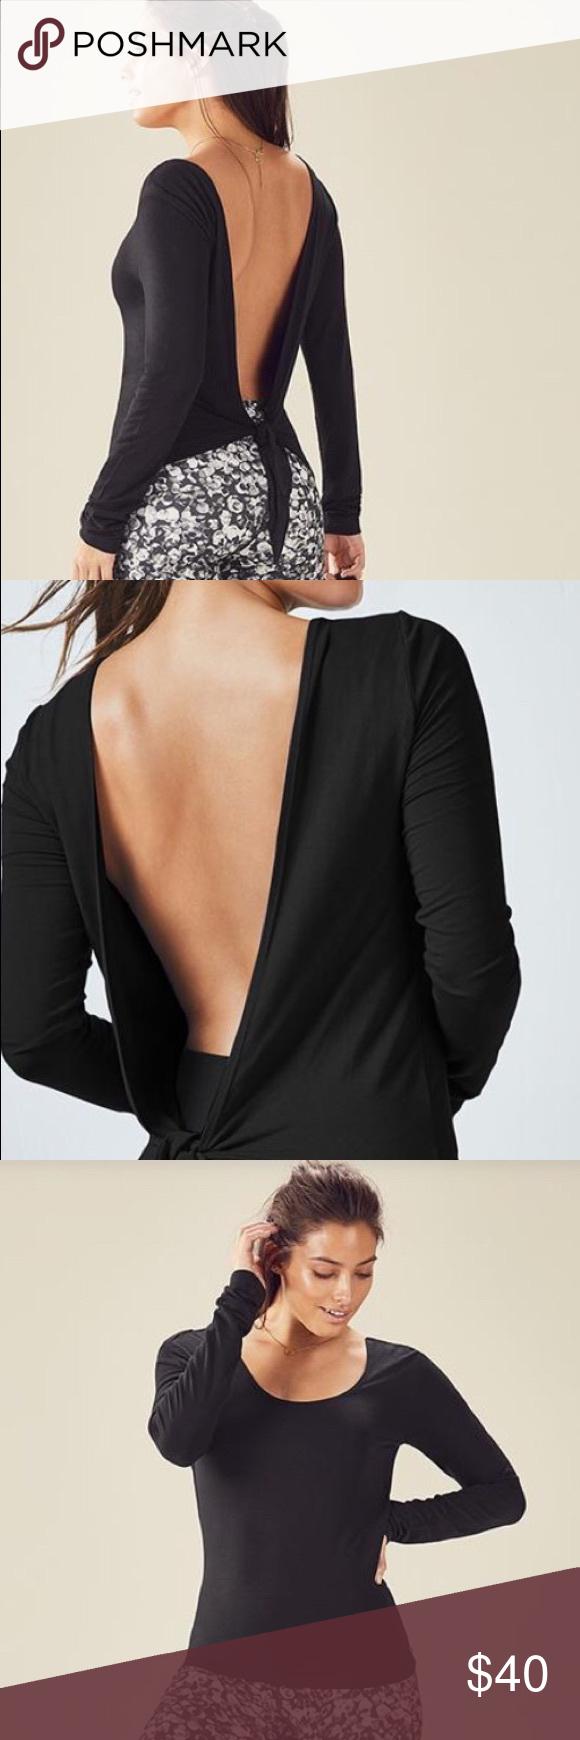 Fabletics Karen Black Shirt Size Small Nwt My Posh Picks